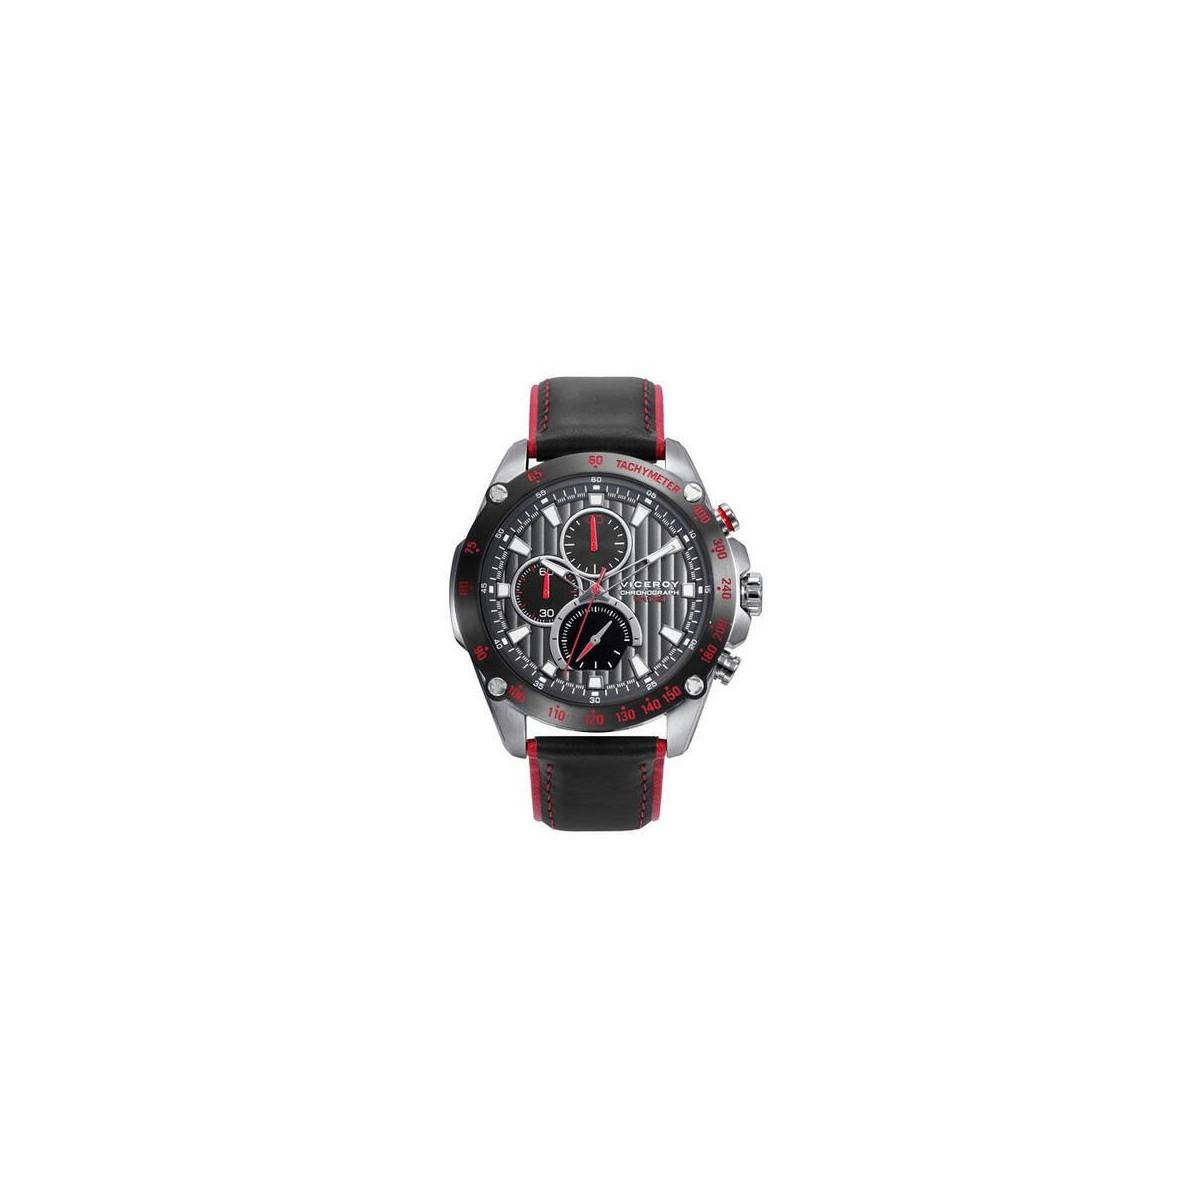 Reloj Viceroy Magnum Crono 46811-17